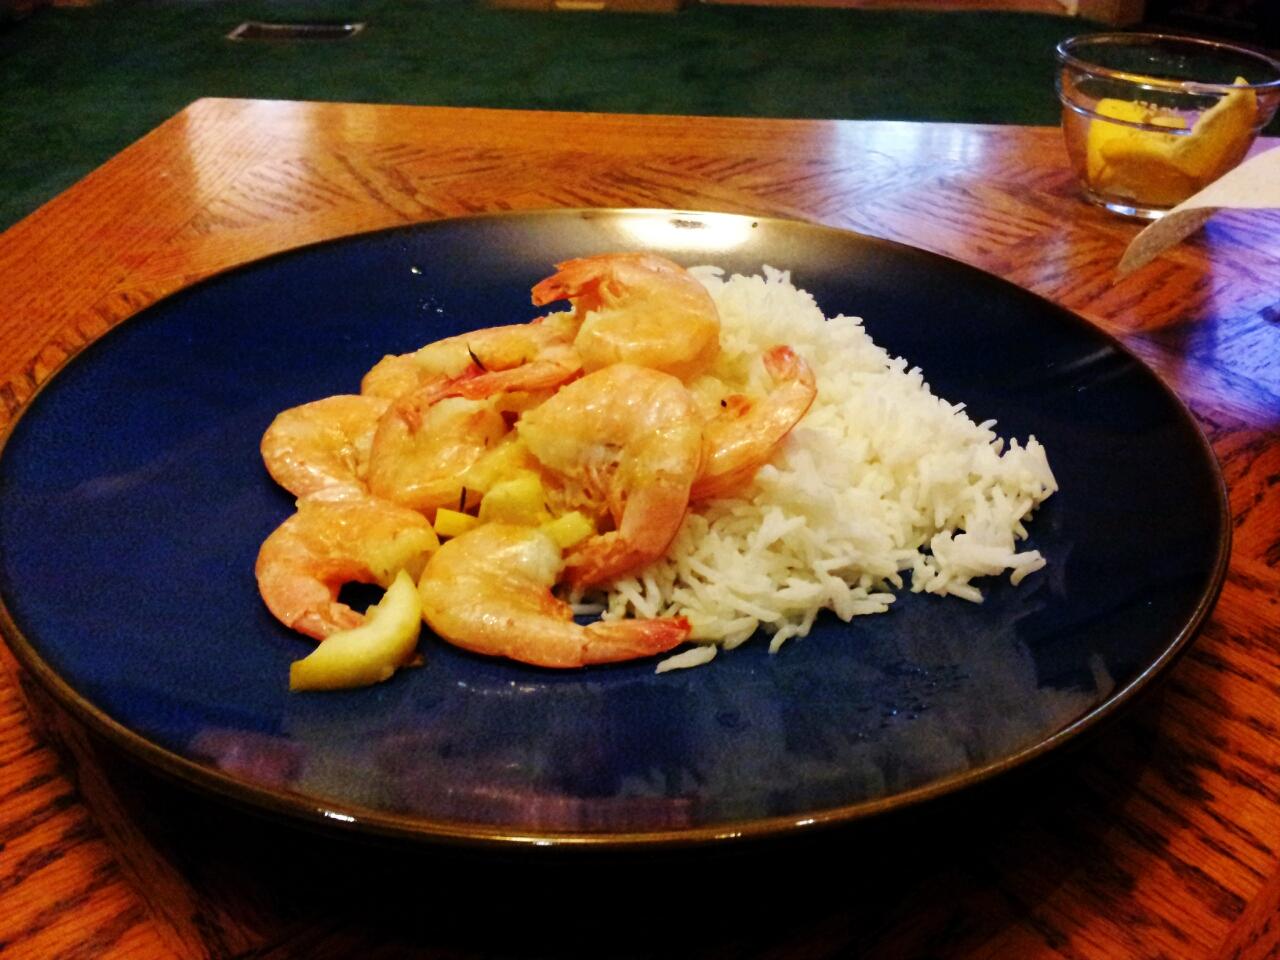 Only in Peterborough: Last Night's Dinner - Roasted Lemon ...